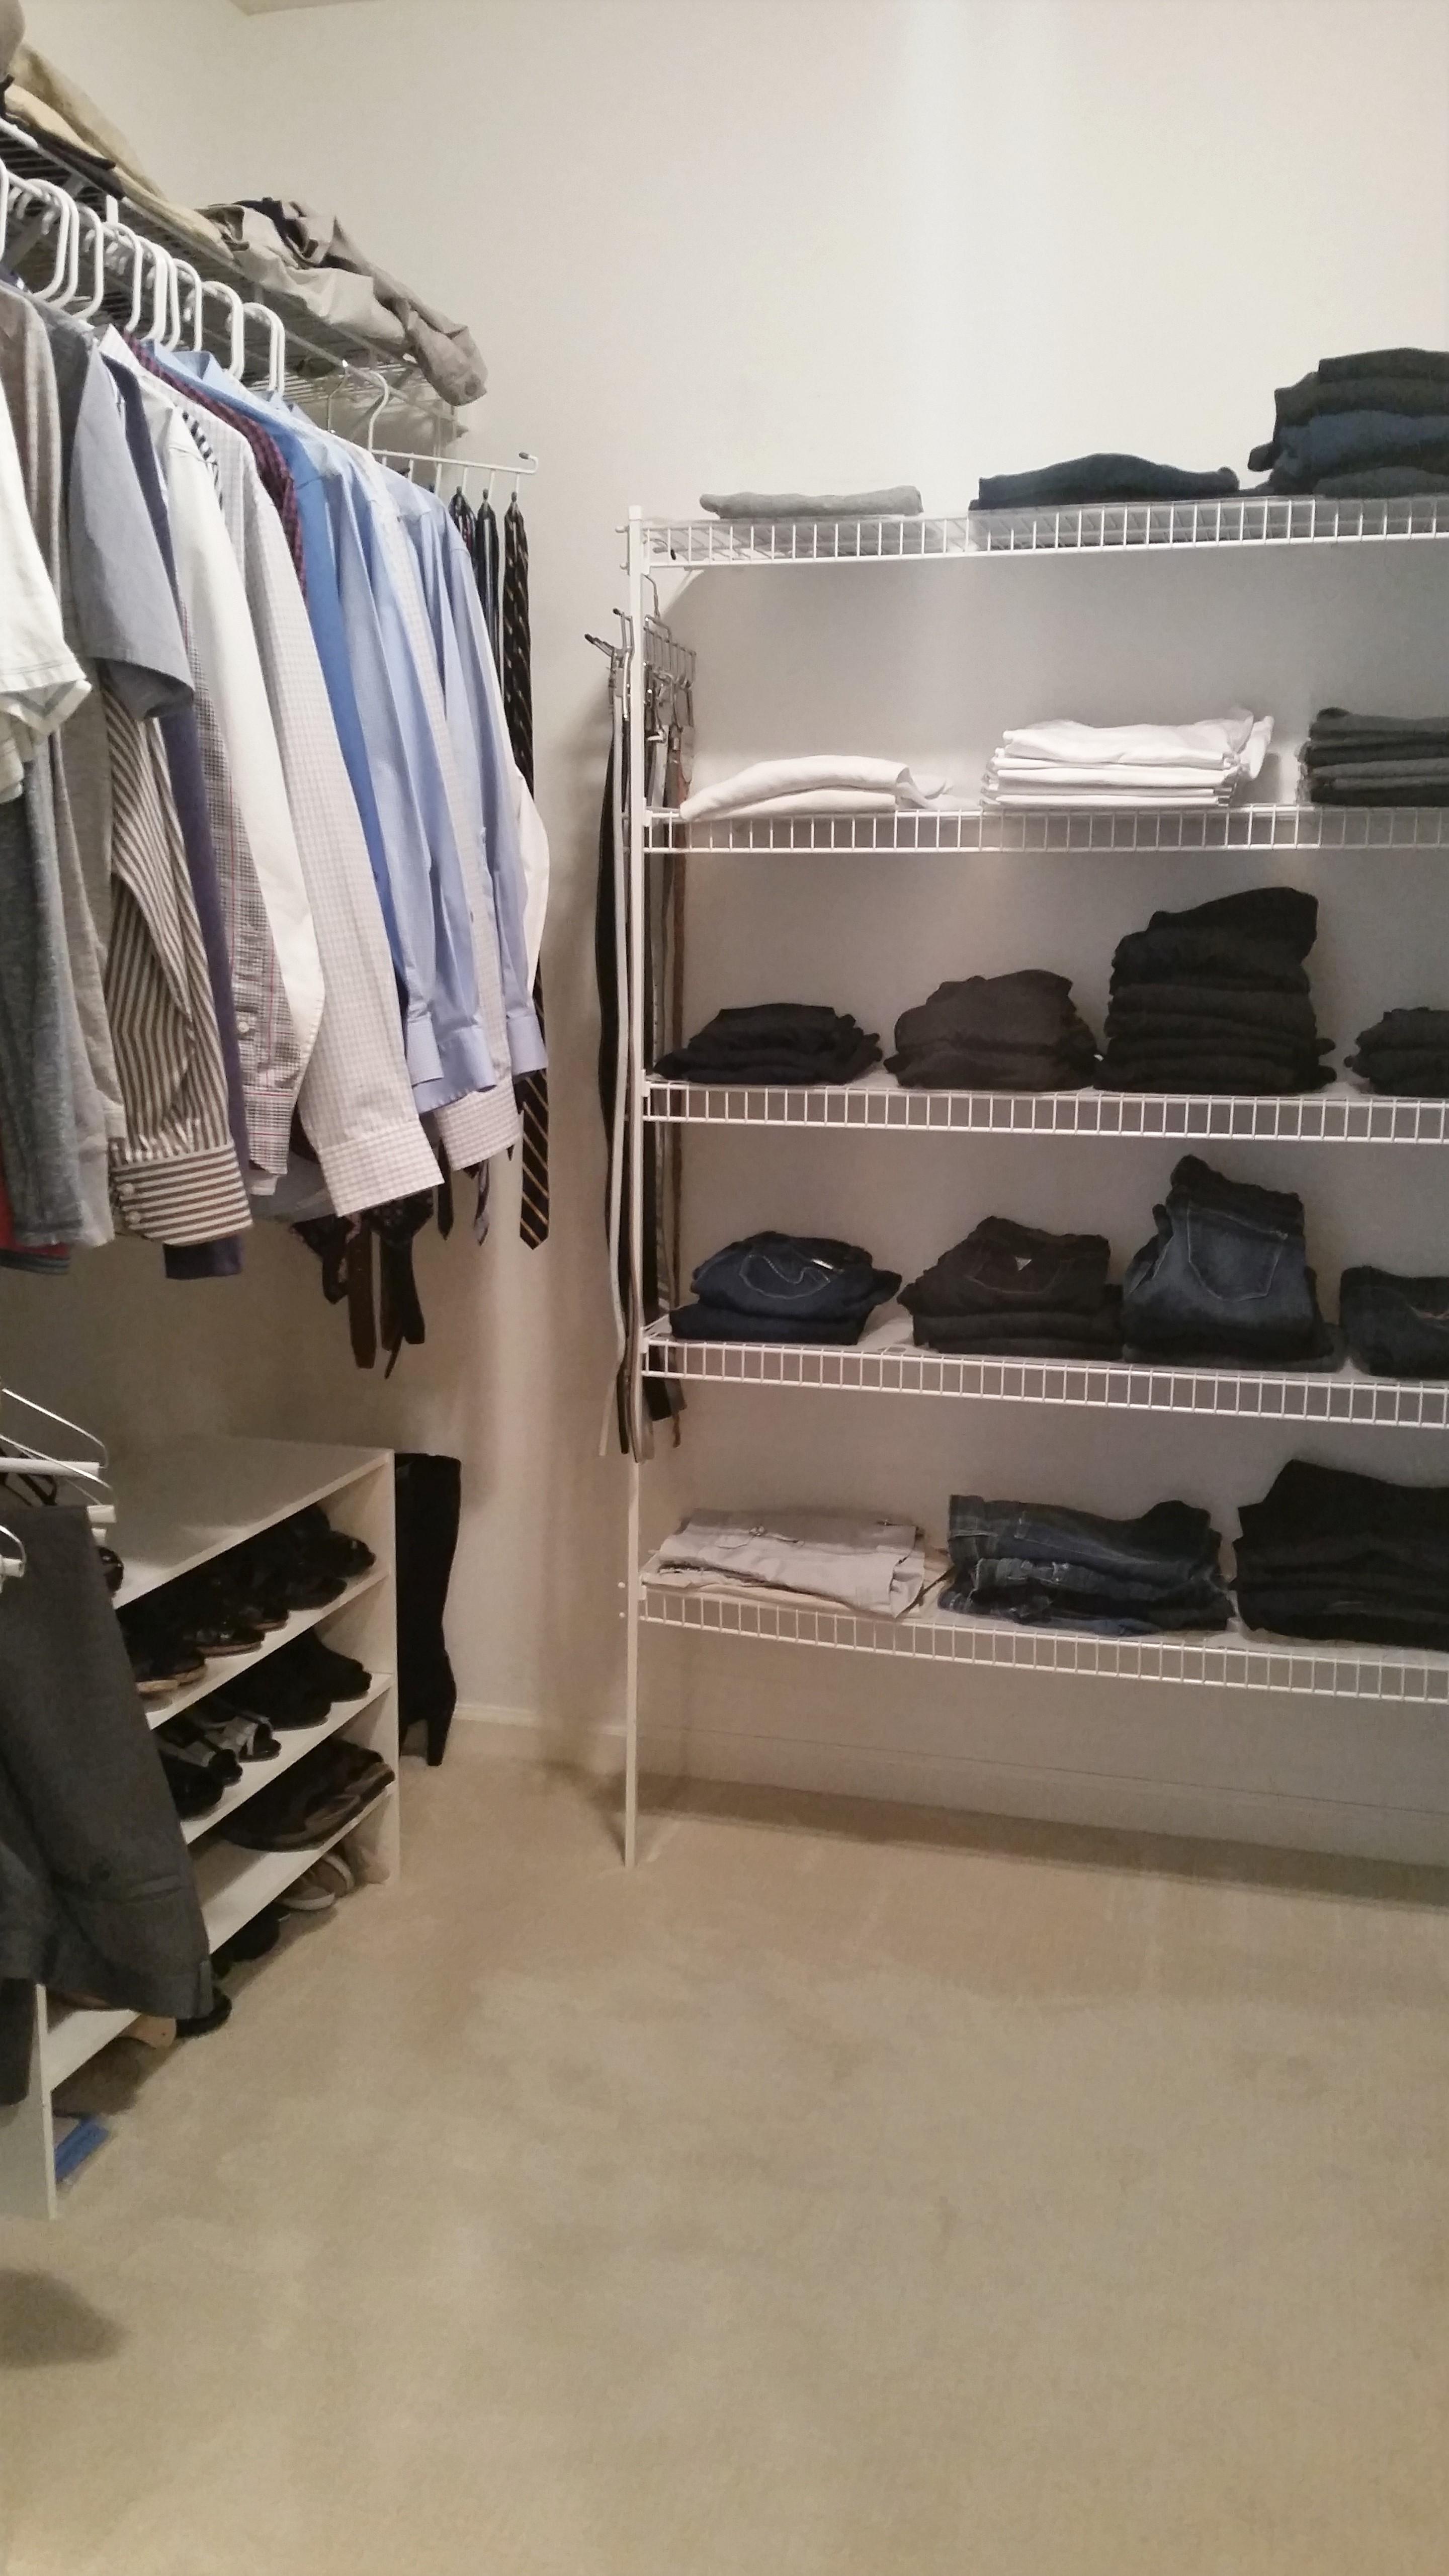 Closet before J